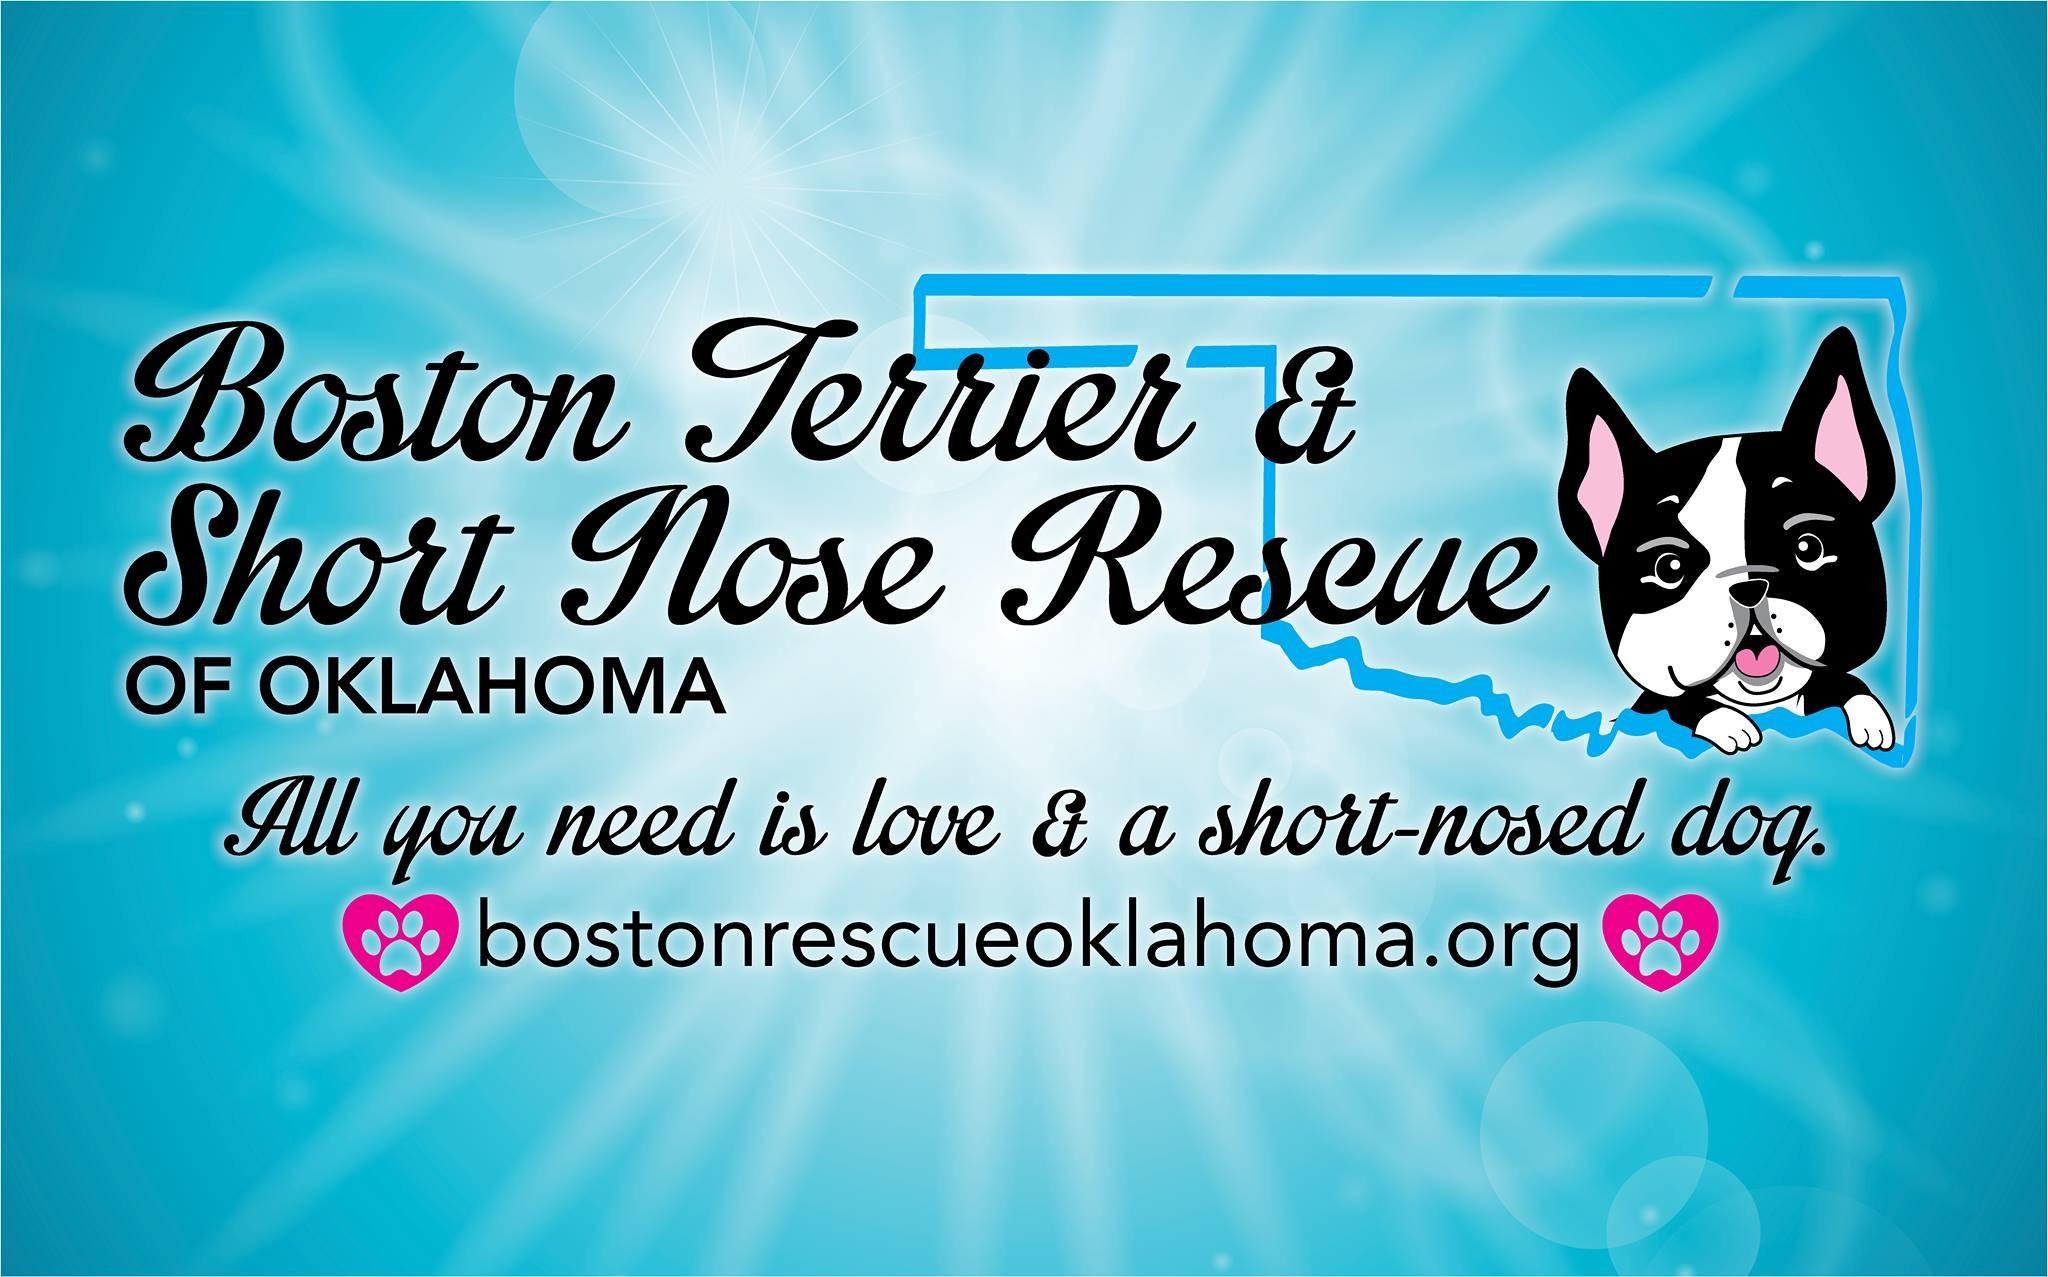 Boston Terrier & Short Nose Rescue of Oklahoma